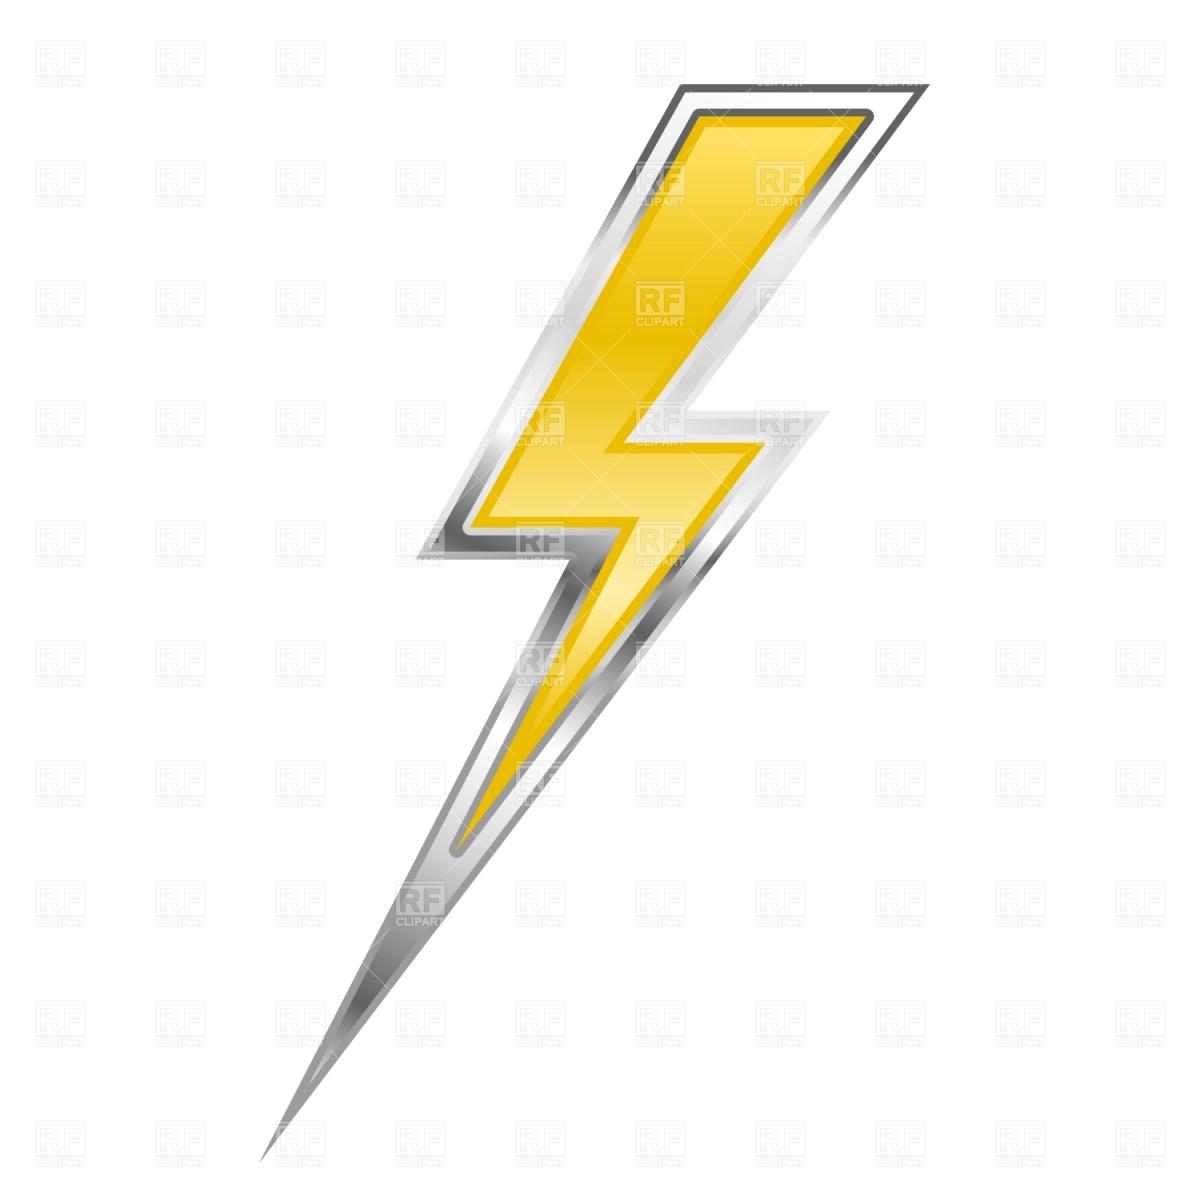 Harry Potter Lightning Bolt - Cliparts.co